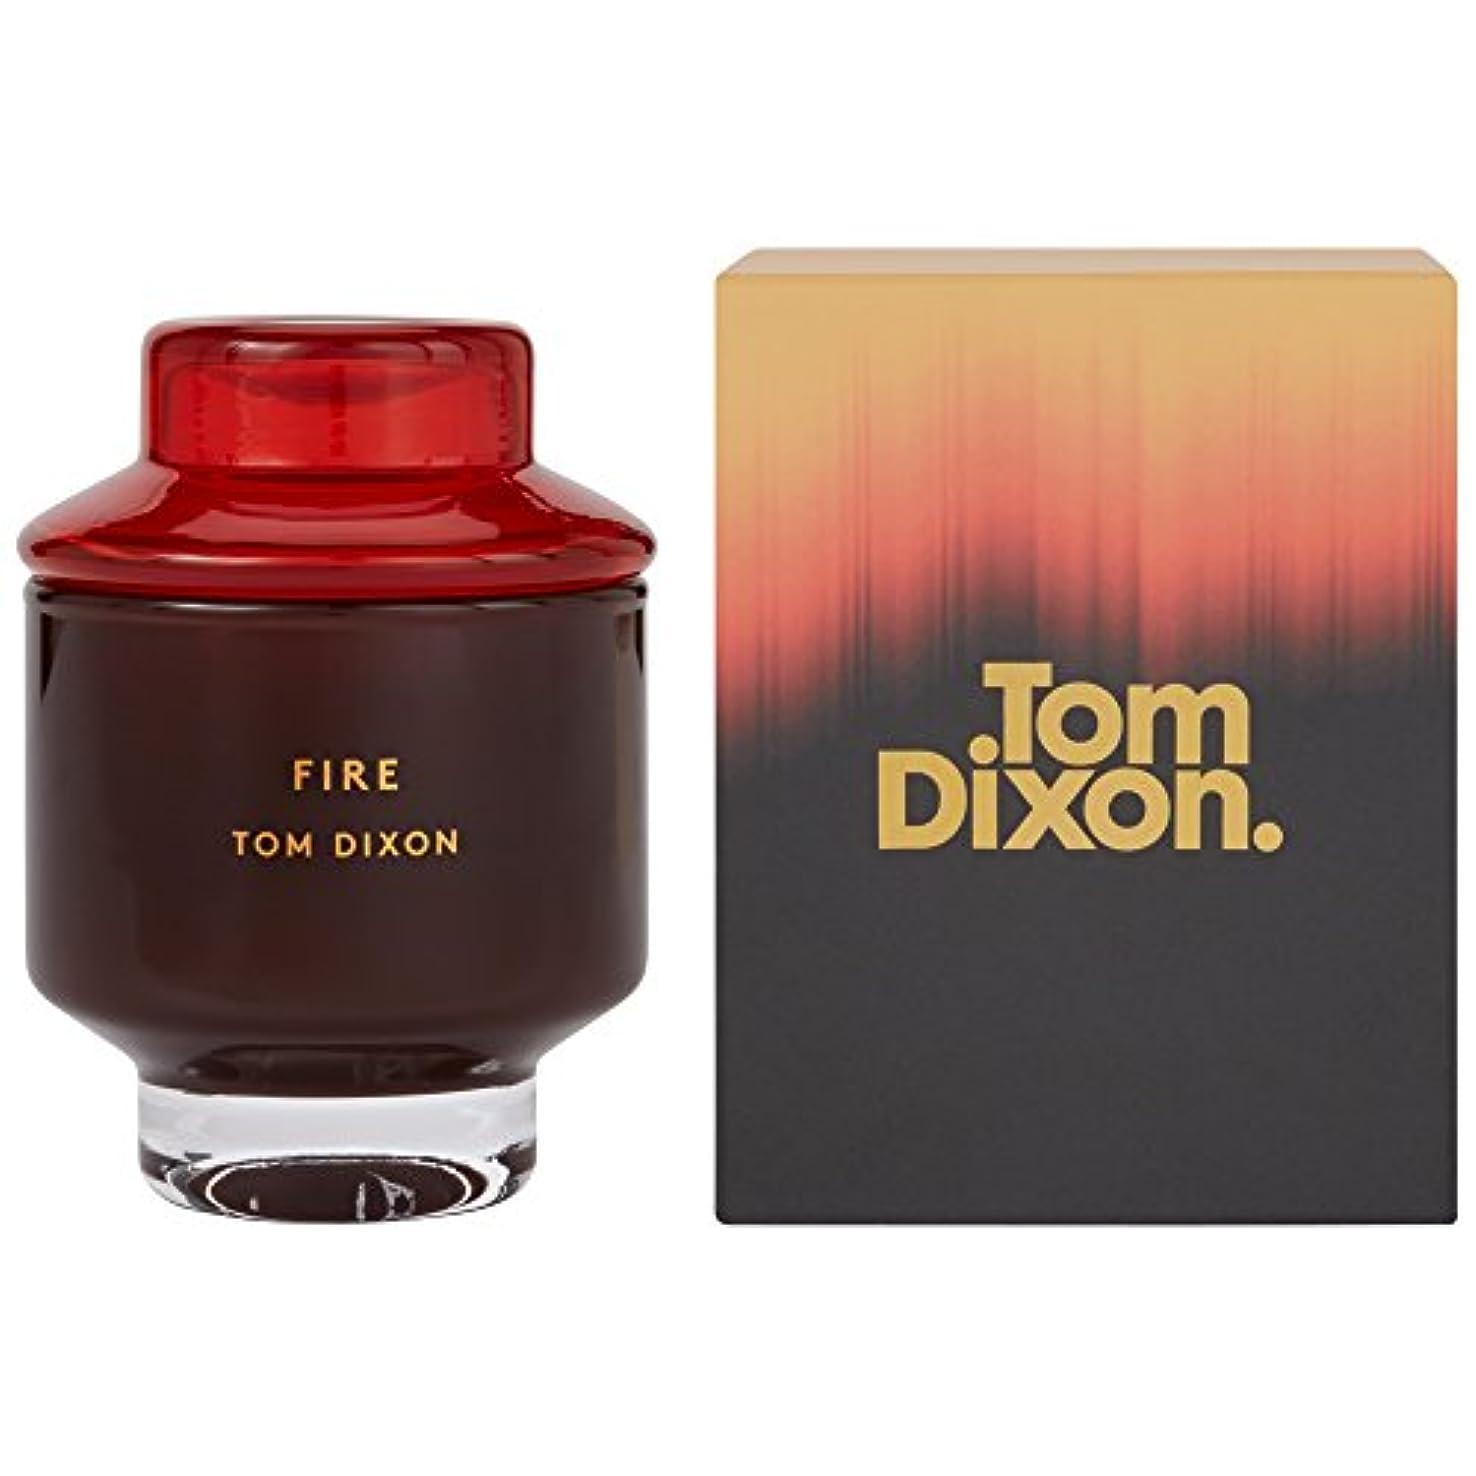 Tom Dixon Fire Scented Candle Medium (Pack of 2) - トム?ディクソン火災香りのキャンドル媒体 x2 [並行輸入品]